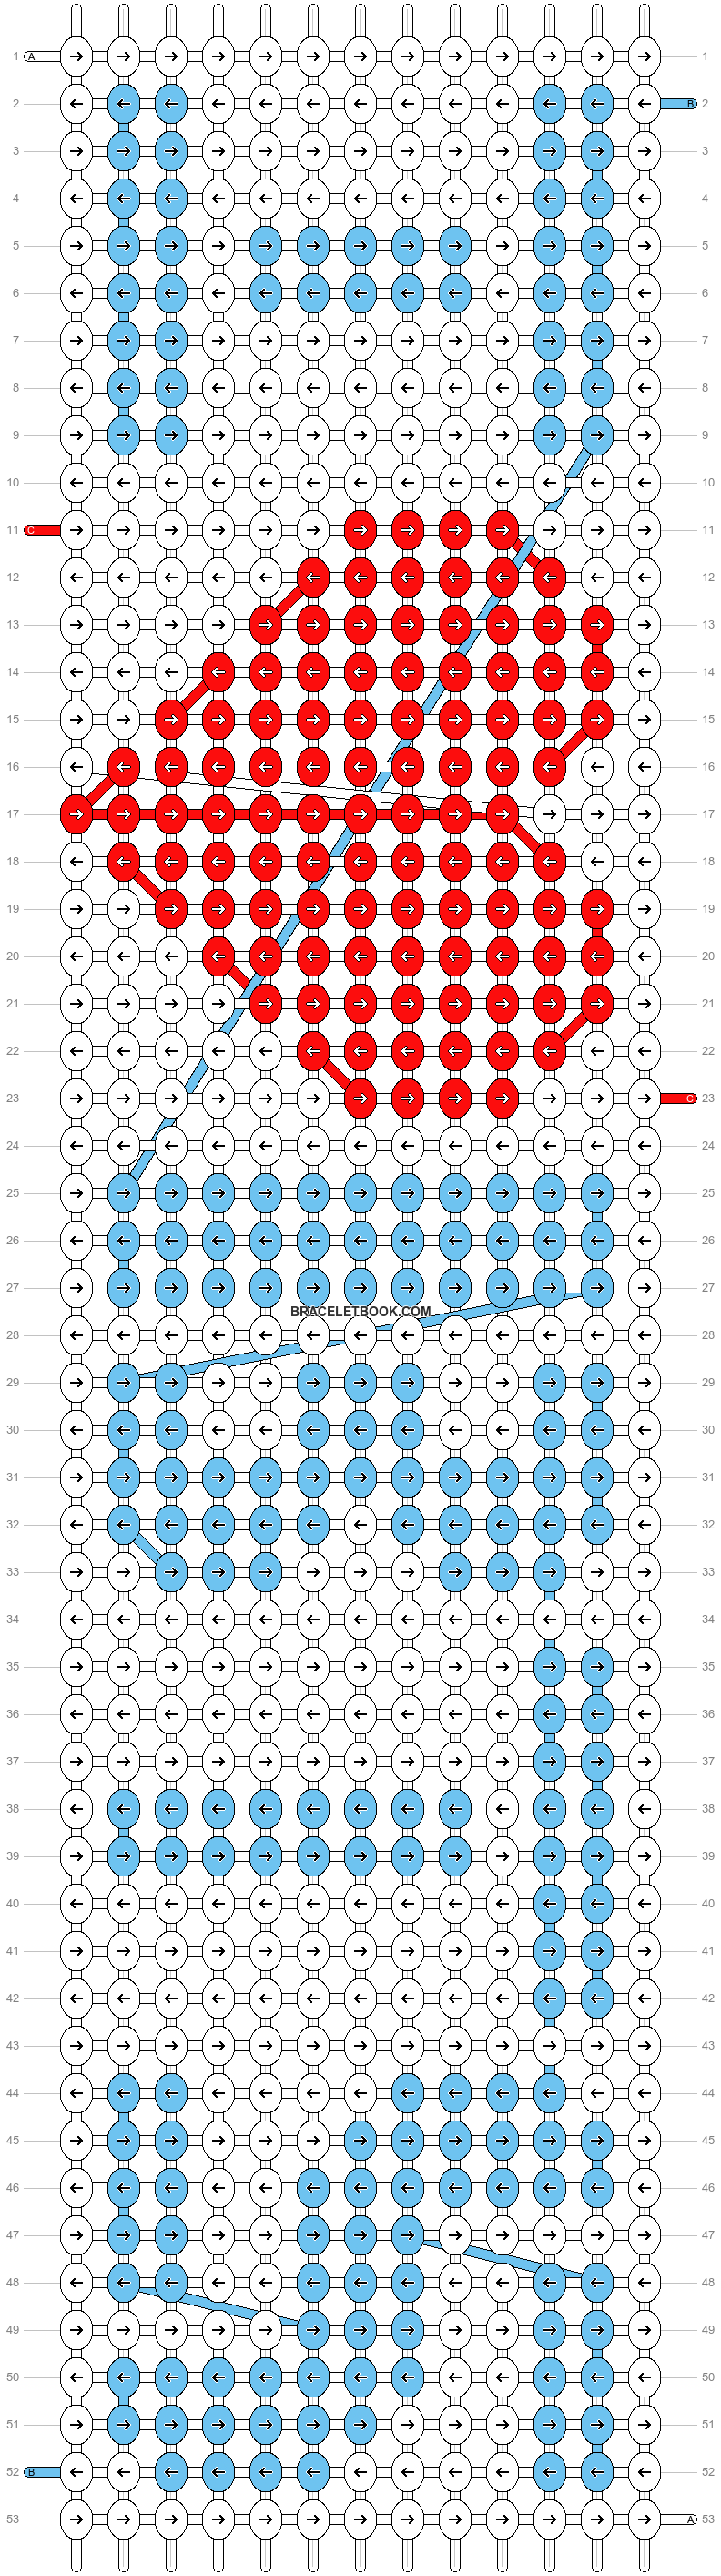 Alpha pattern #18455 pattern